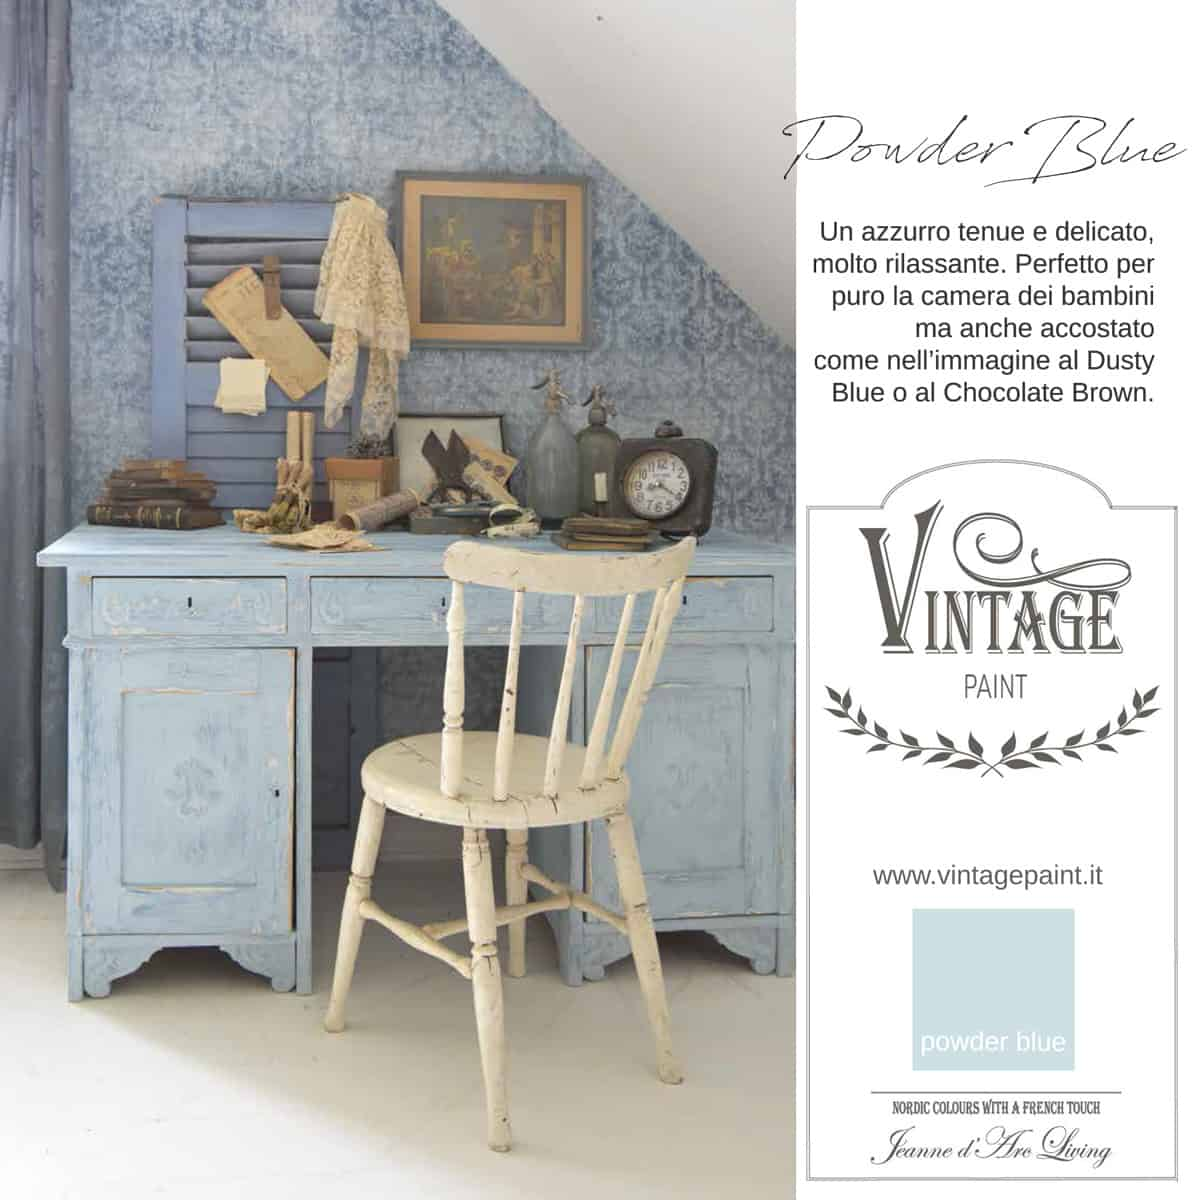 powder blue blu azzurro vintage chalk paint vernici shabby chic autentico look gesso